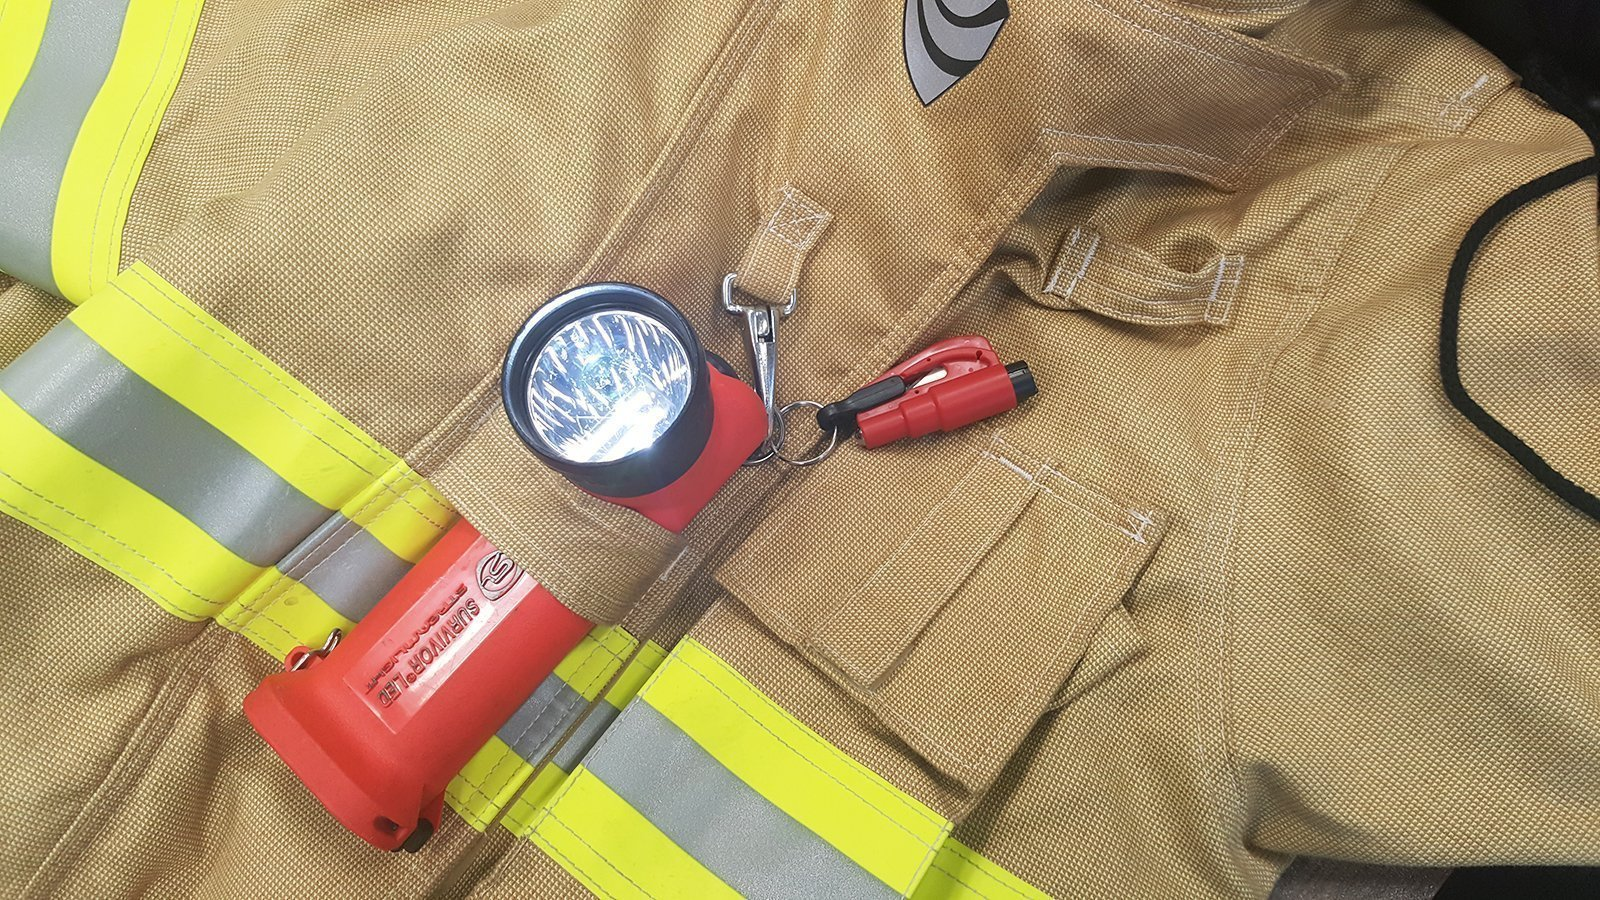 flashfire supply outil sauvetage 3 en 1 coupe ceinture brise vitres. Black Bedroom Furniture Sets. Home Design Ideas